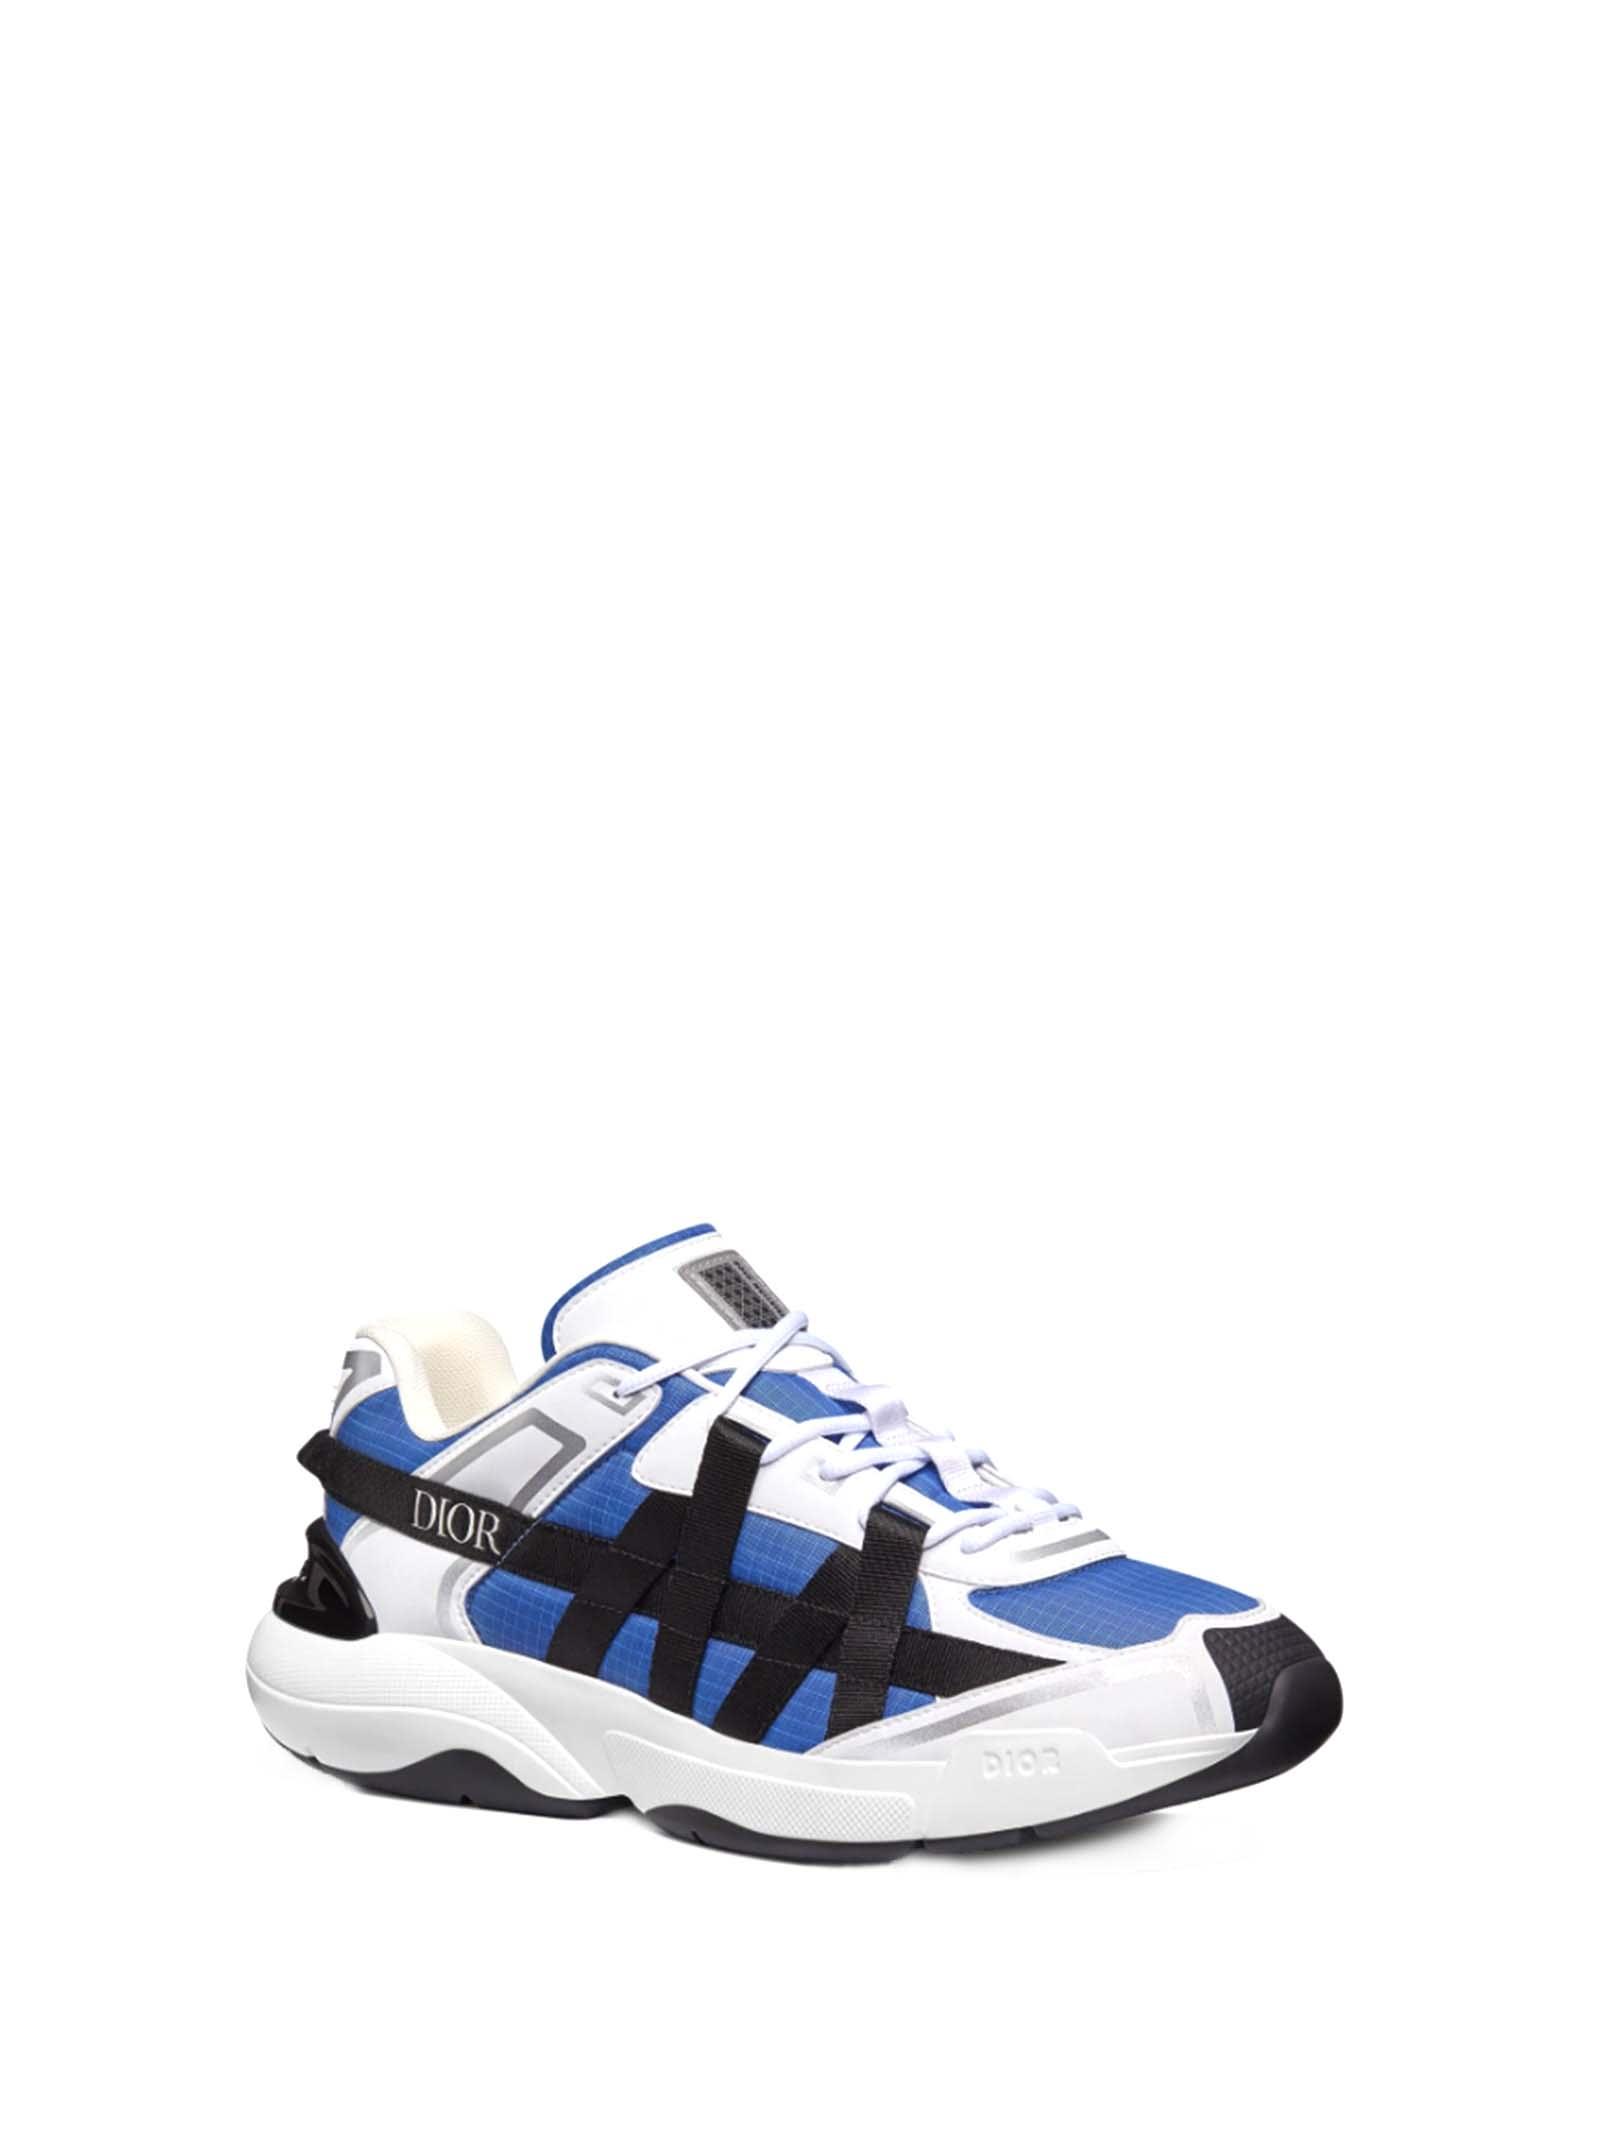 Dior Homme Sneakers | italist, ALWAYS